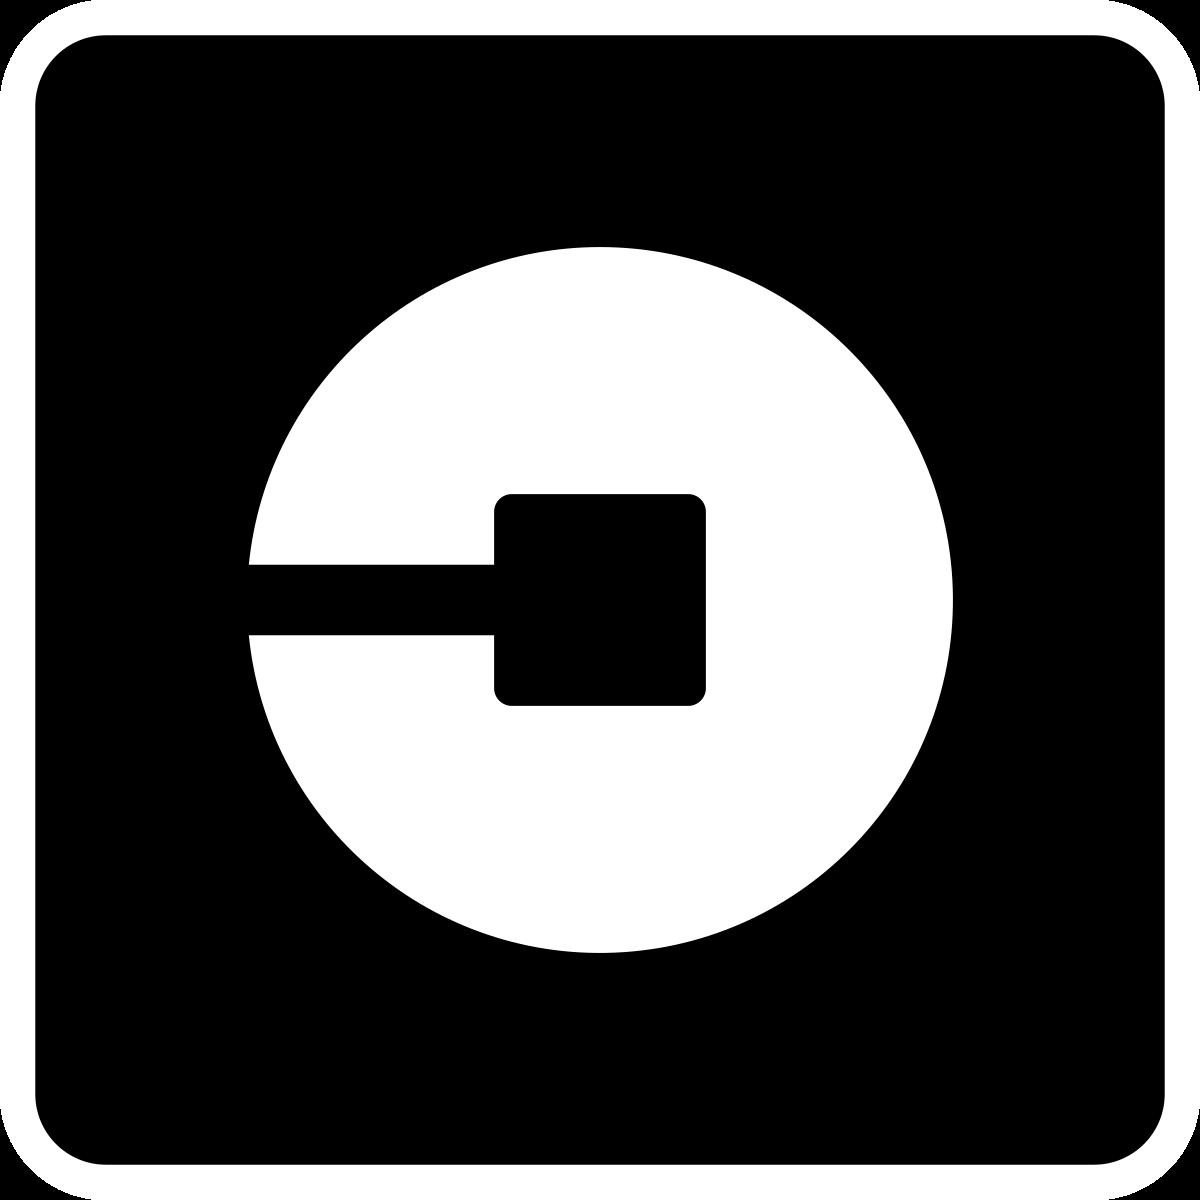 Image for product Uber in the marketplace NachoNacho